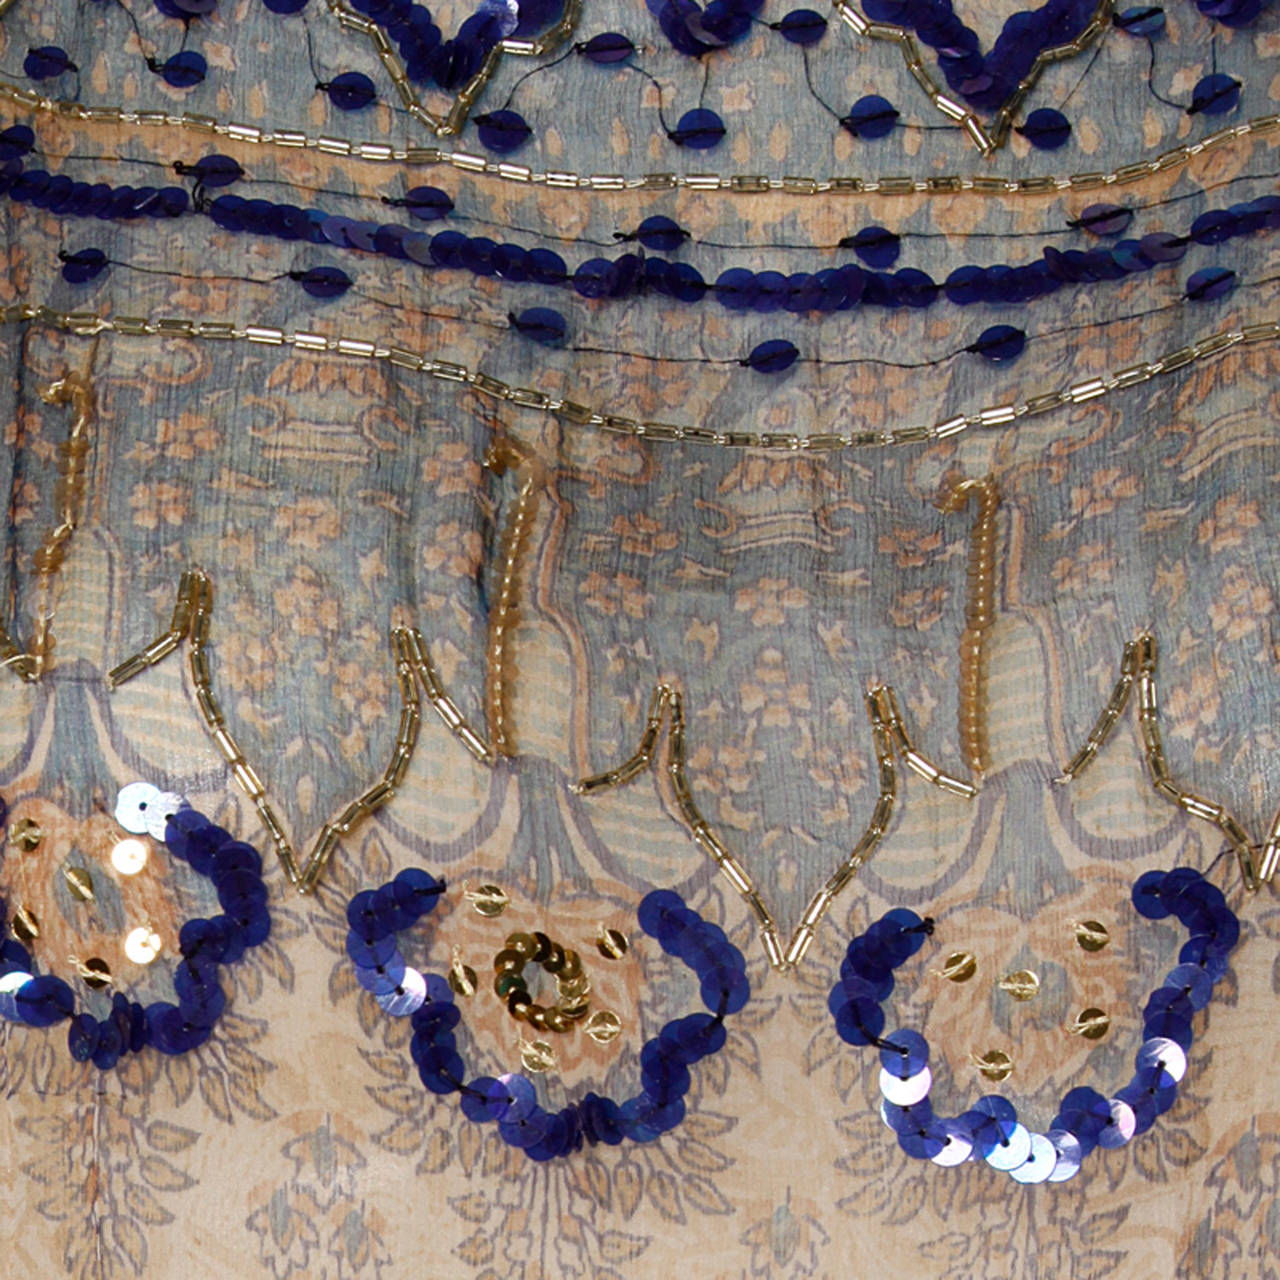 Judith Ann for Bullock's Wilshire Vintage 1970s Silk India Print Dress 5